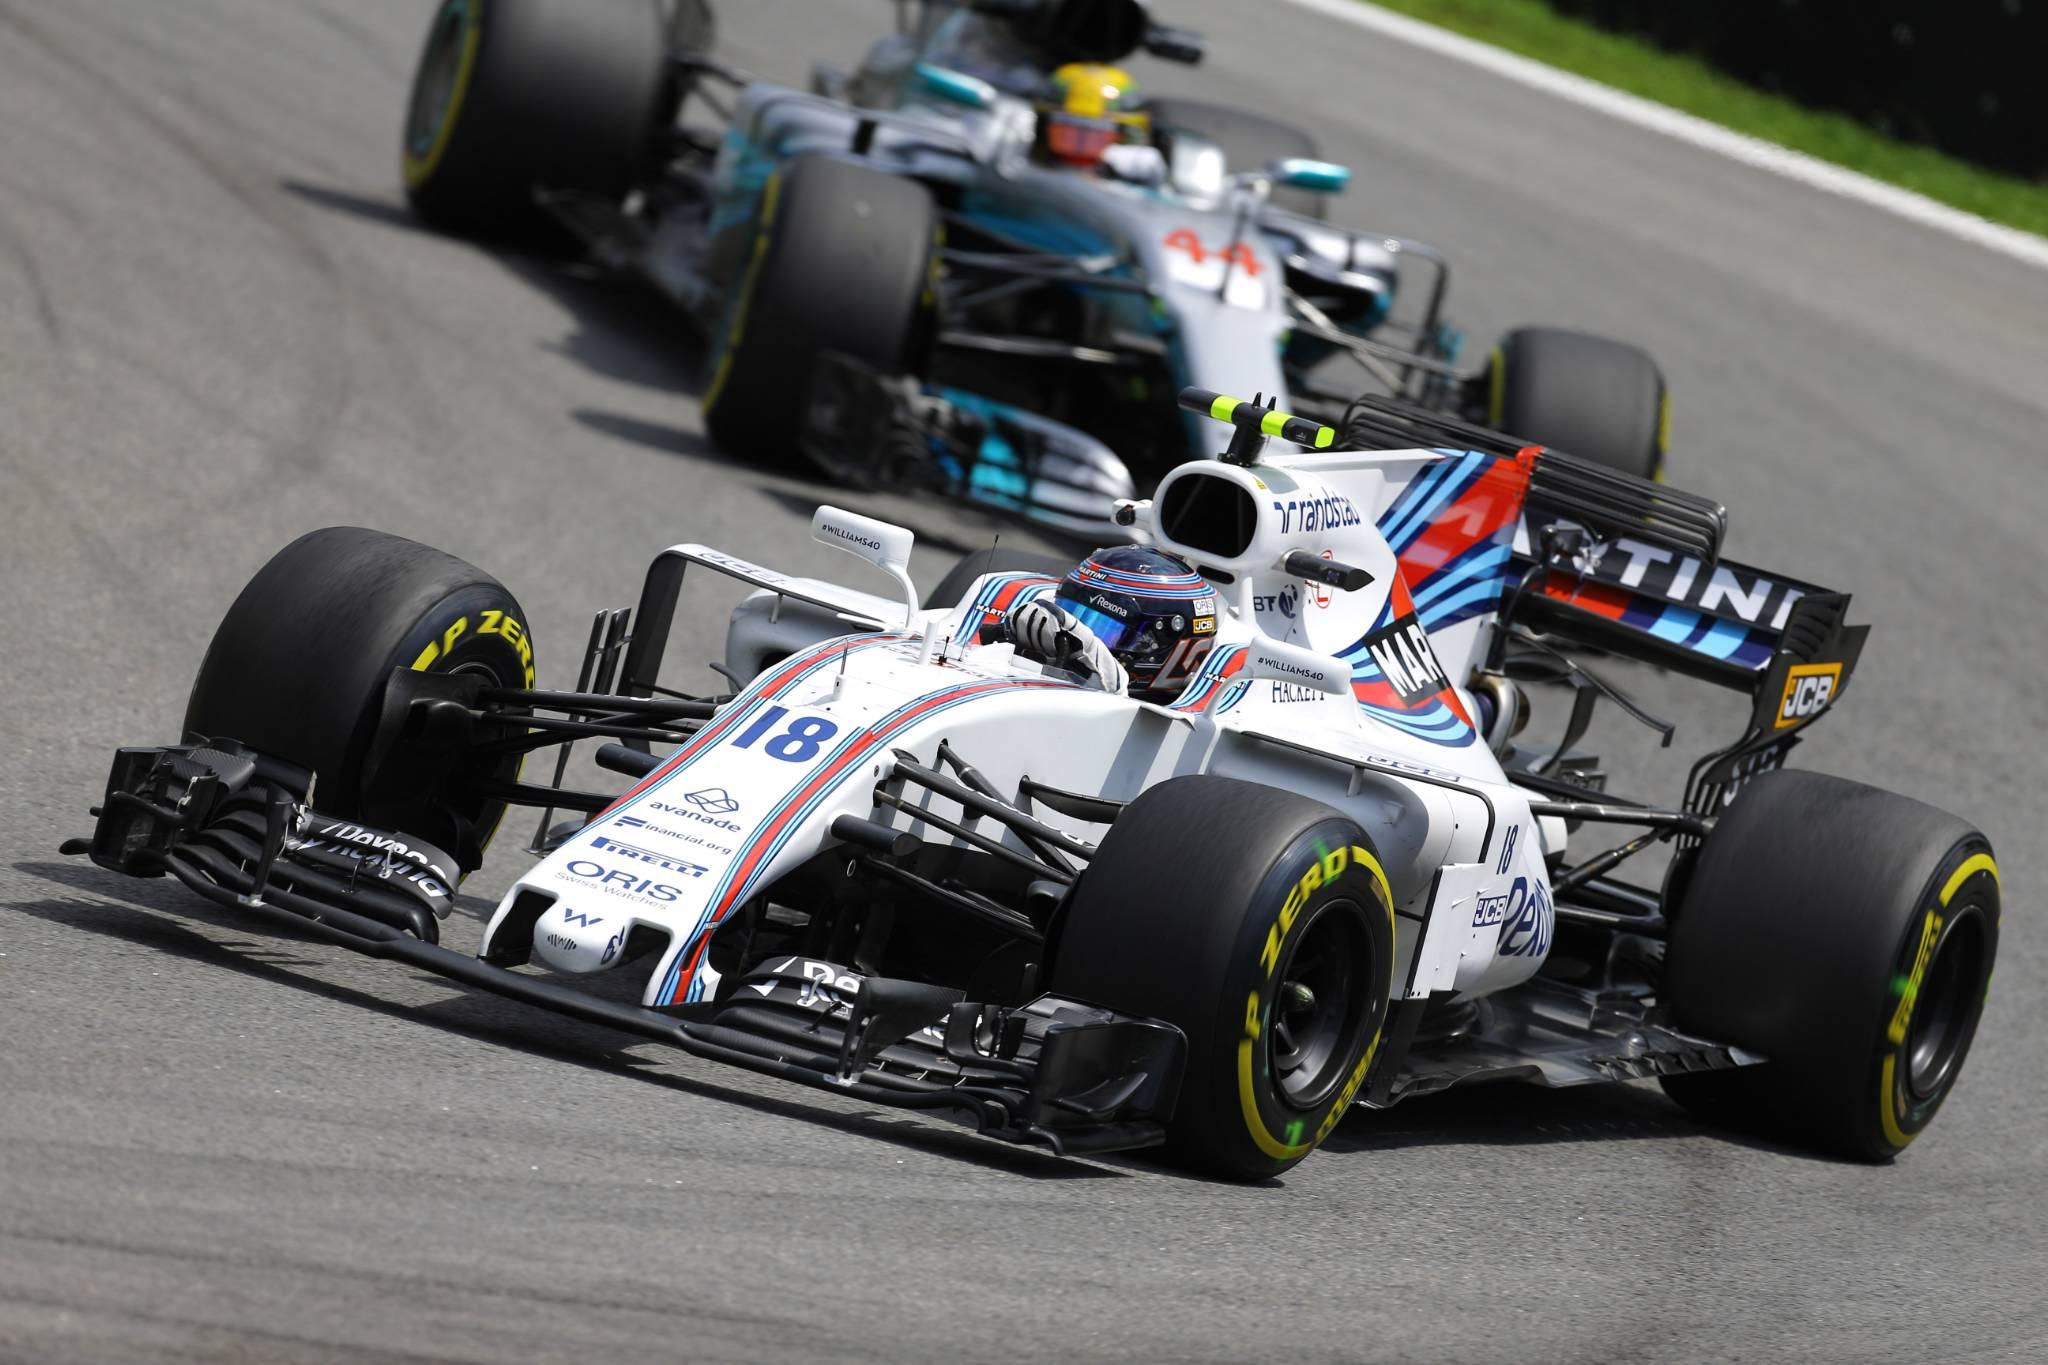 10.11.2017 - Free Practice 2, Lance Stroll (CDN) Williams FW40 and Lewis Hamilton (GBR) Mercedes AMG F1 W08